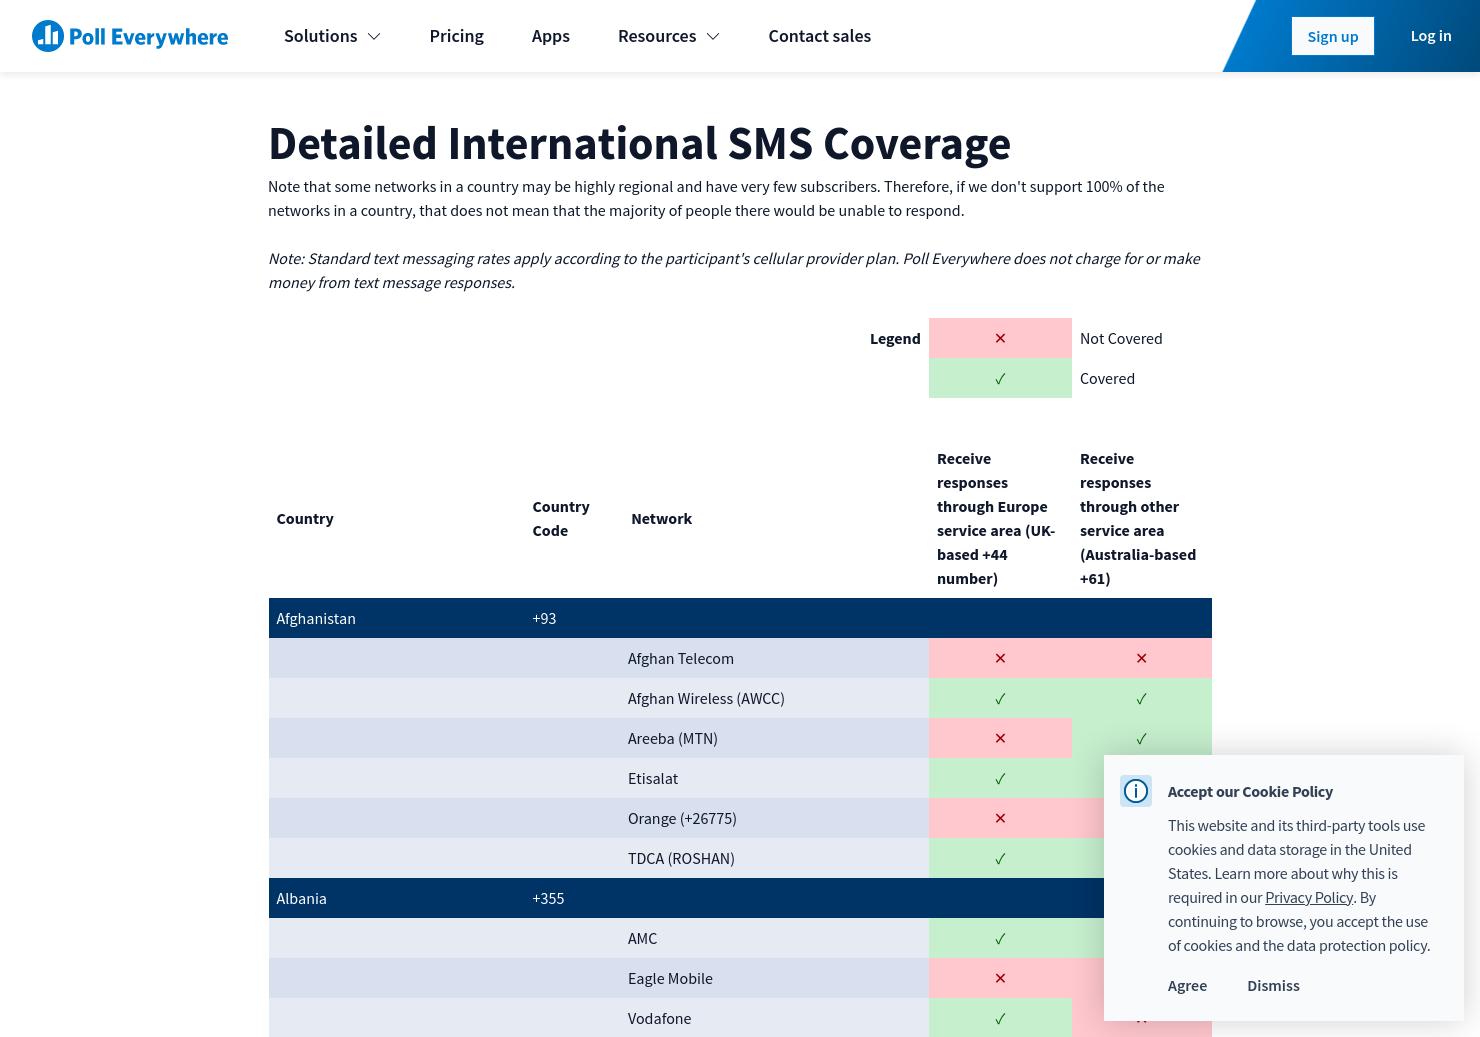 International SMS Coverage | Poll Everywhere